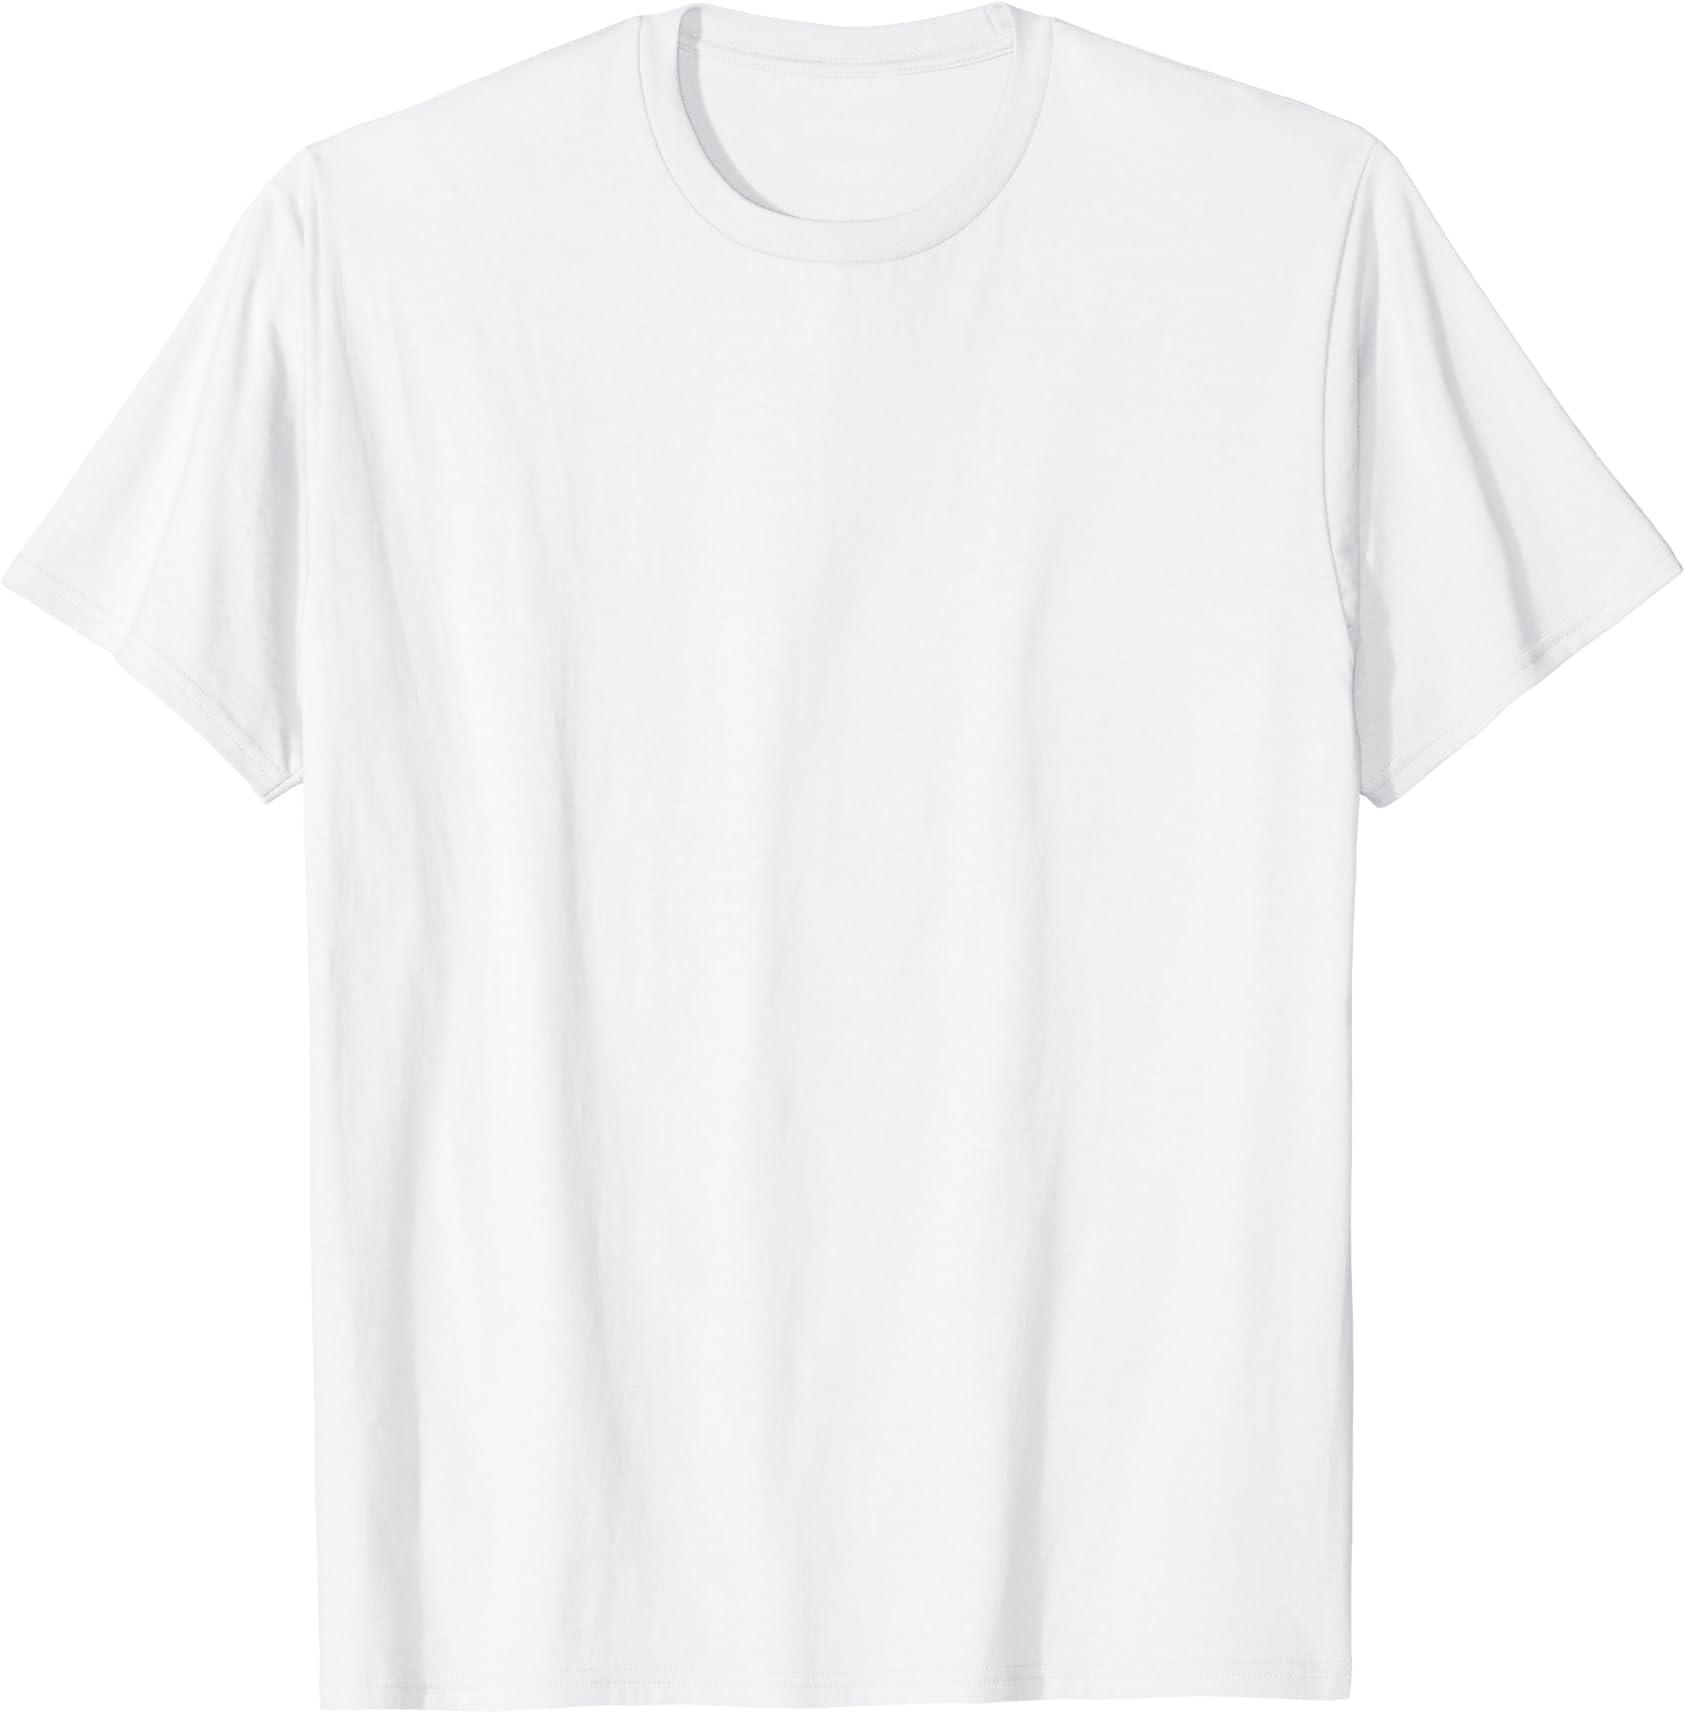 New World Order T-Shirt Men/'s Illuminati Conspiracy Political T-Shirt Bilderberg